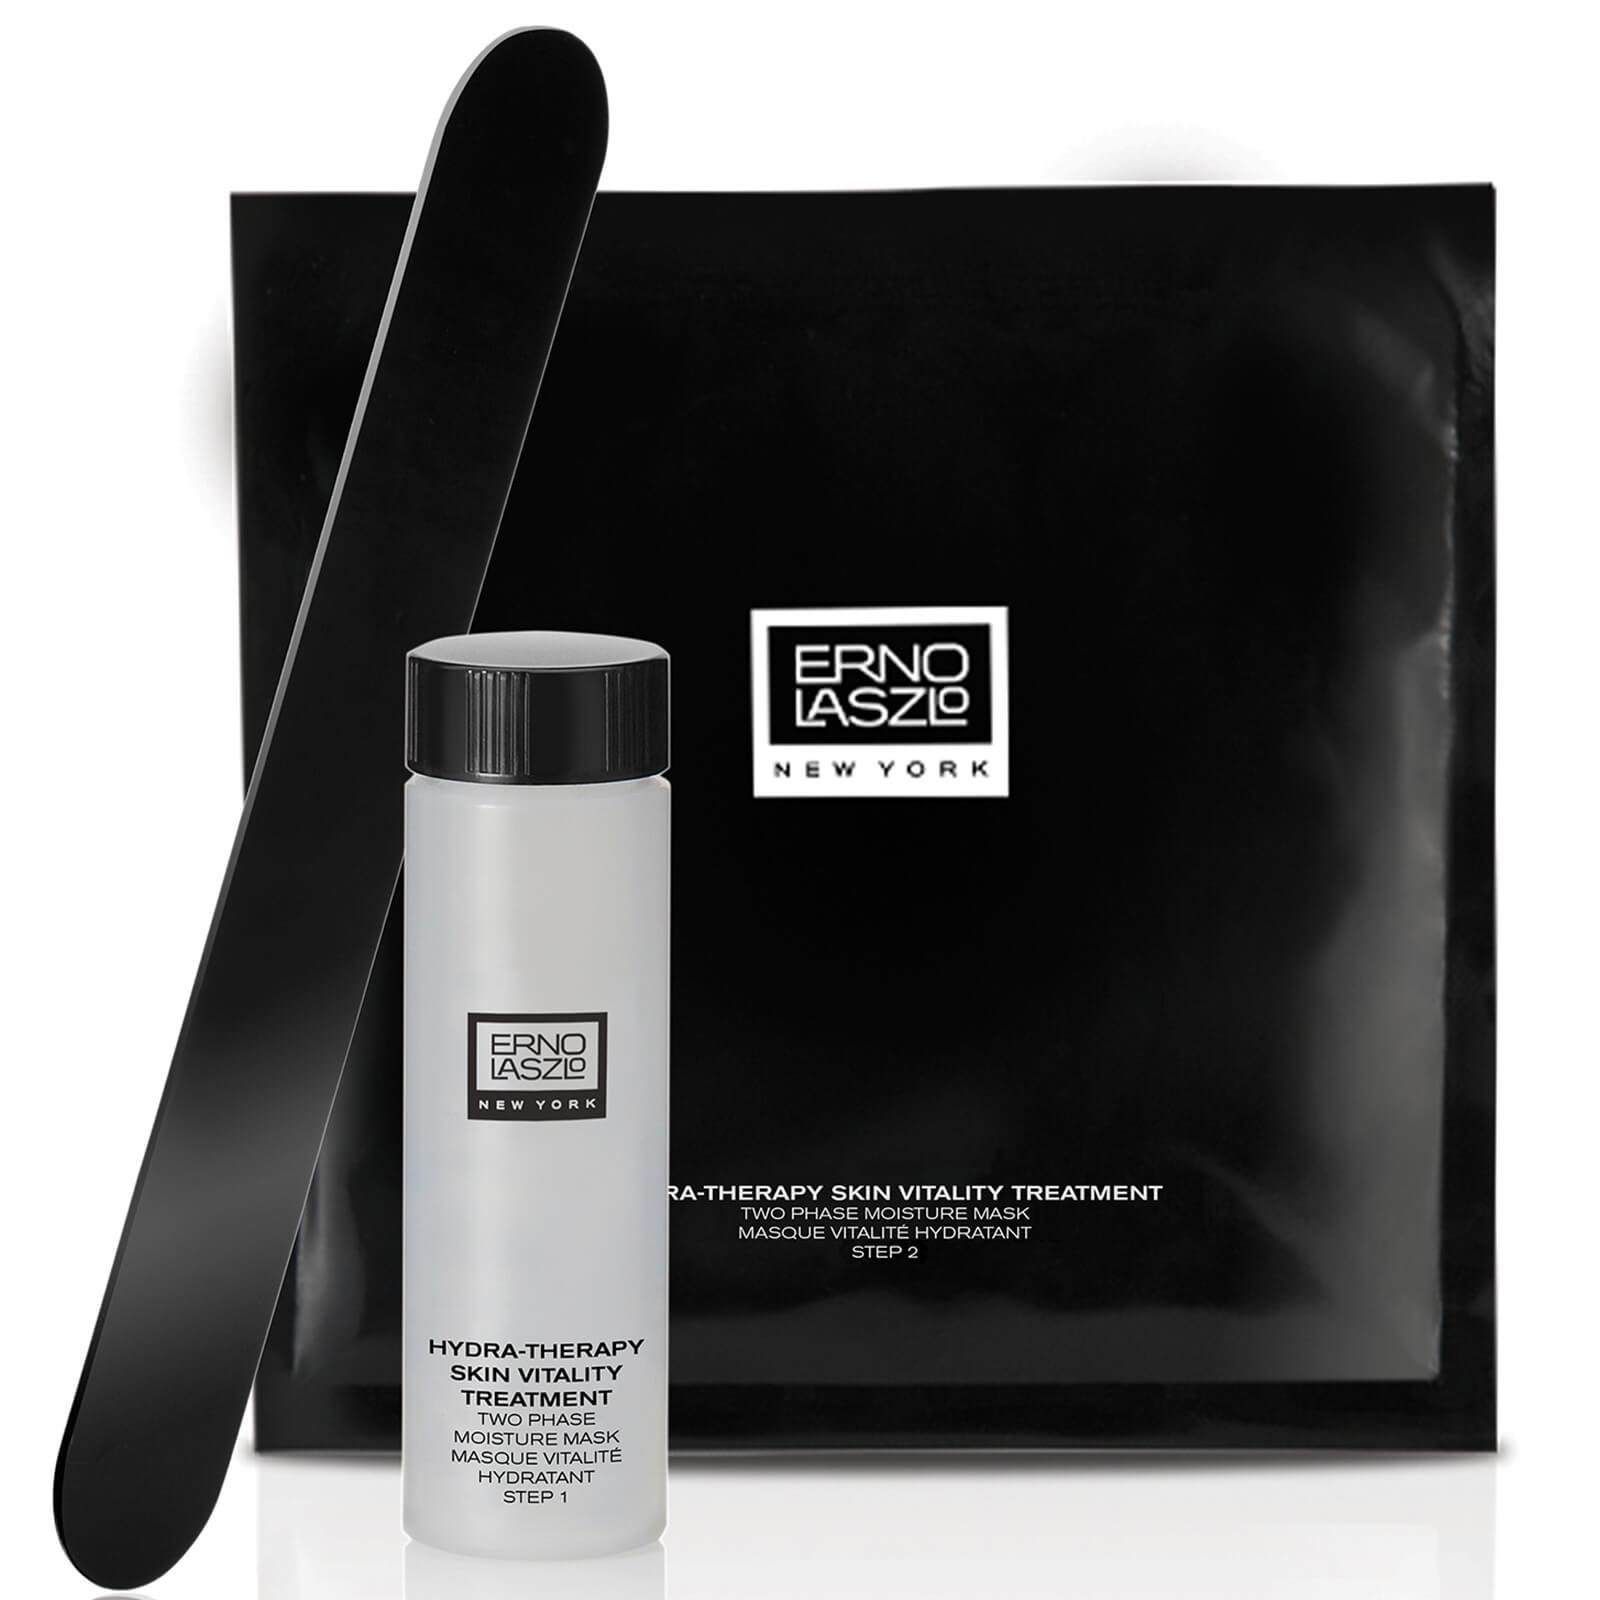 Erno Laszlo Hydra-Therapy Skin Vitality Mask (4 x 37ml)